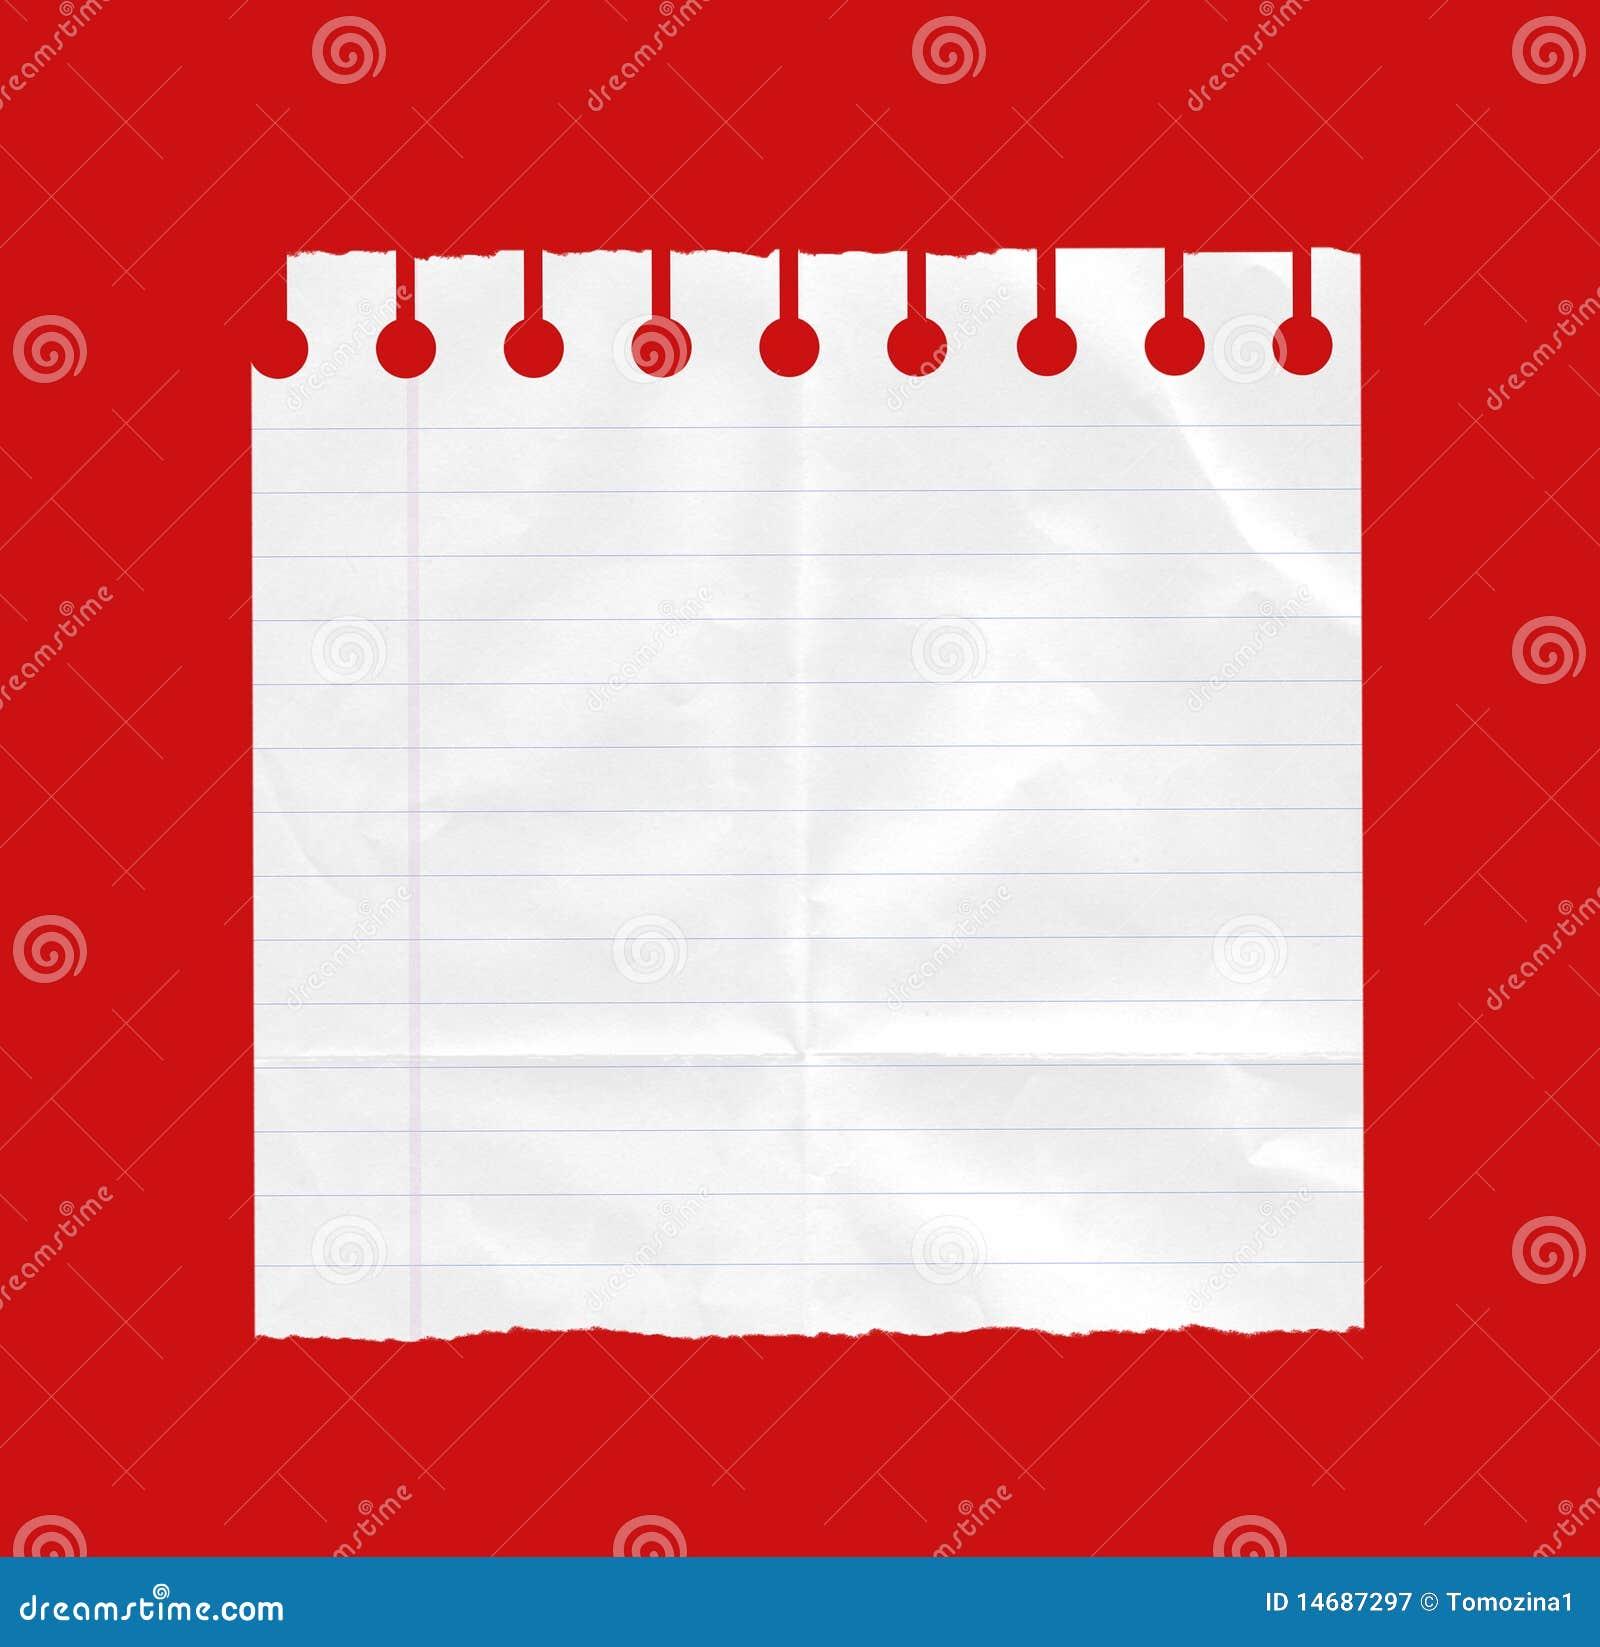 Sheet of white paper